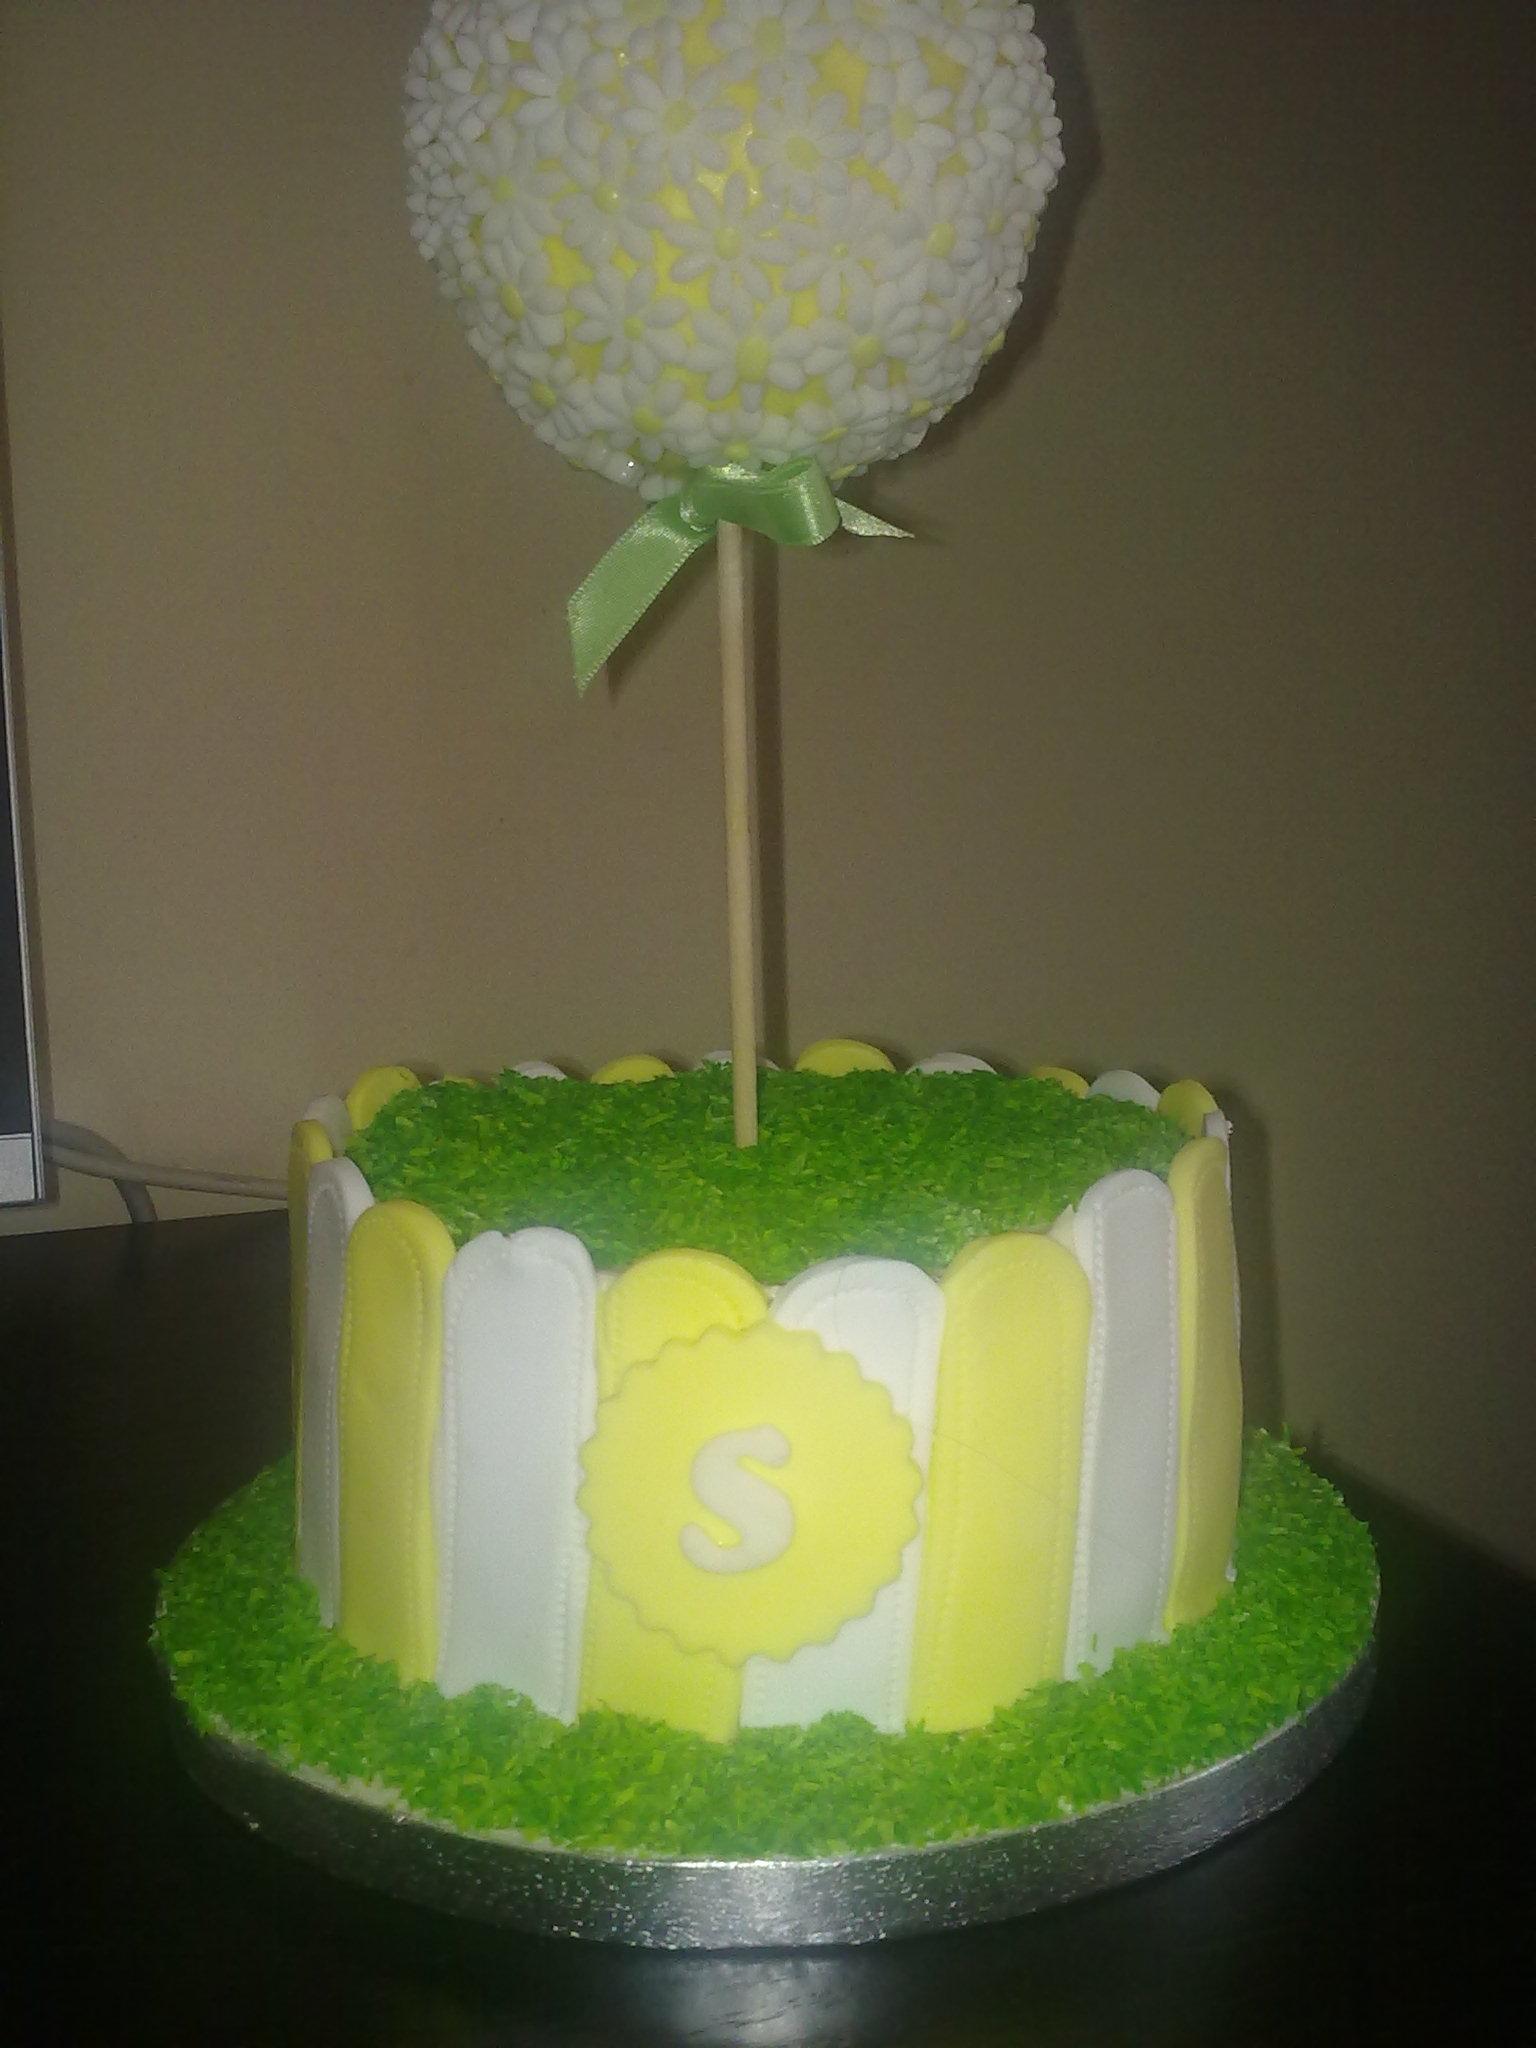 Lemon cake covered in lemon curd buttercream, decorated with fondant.